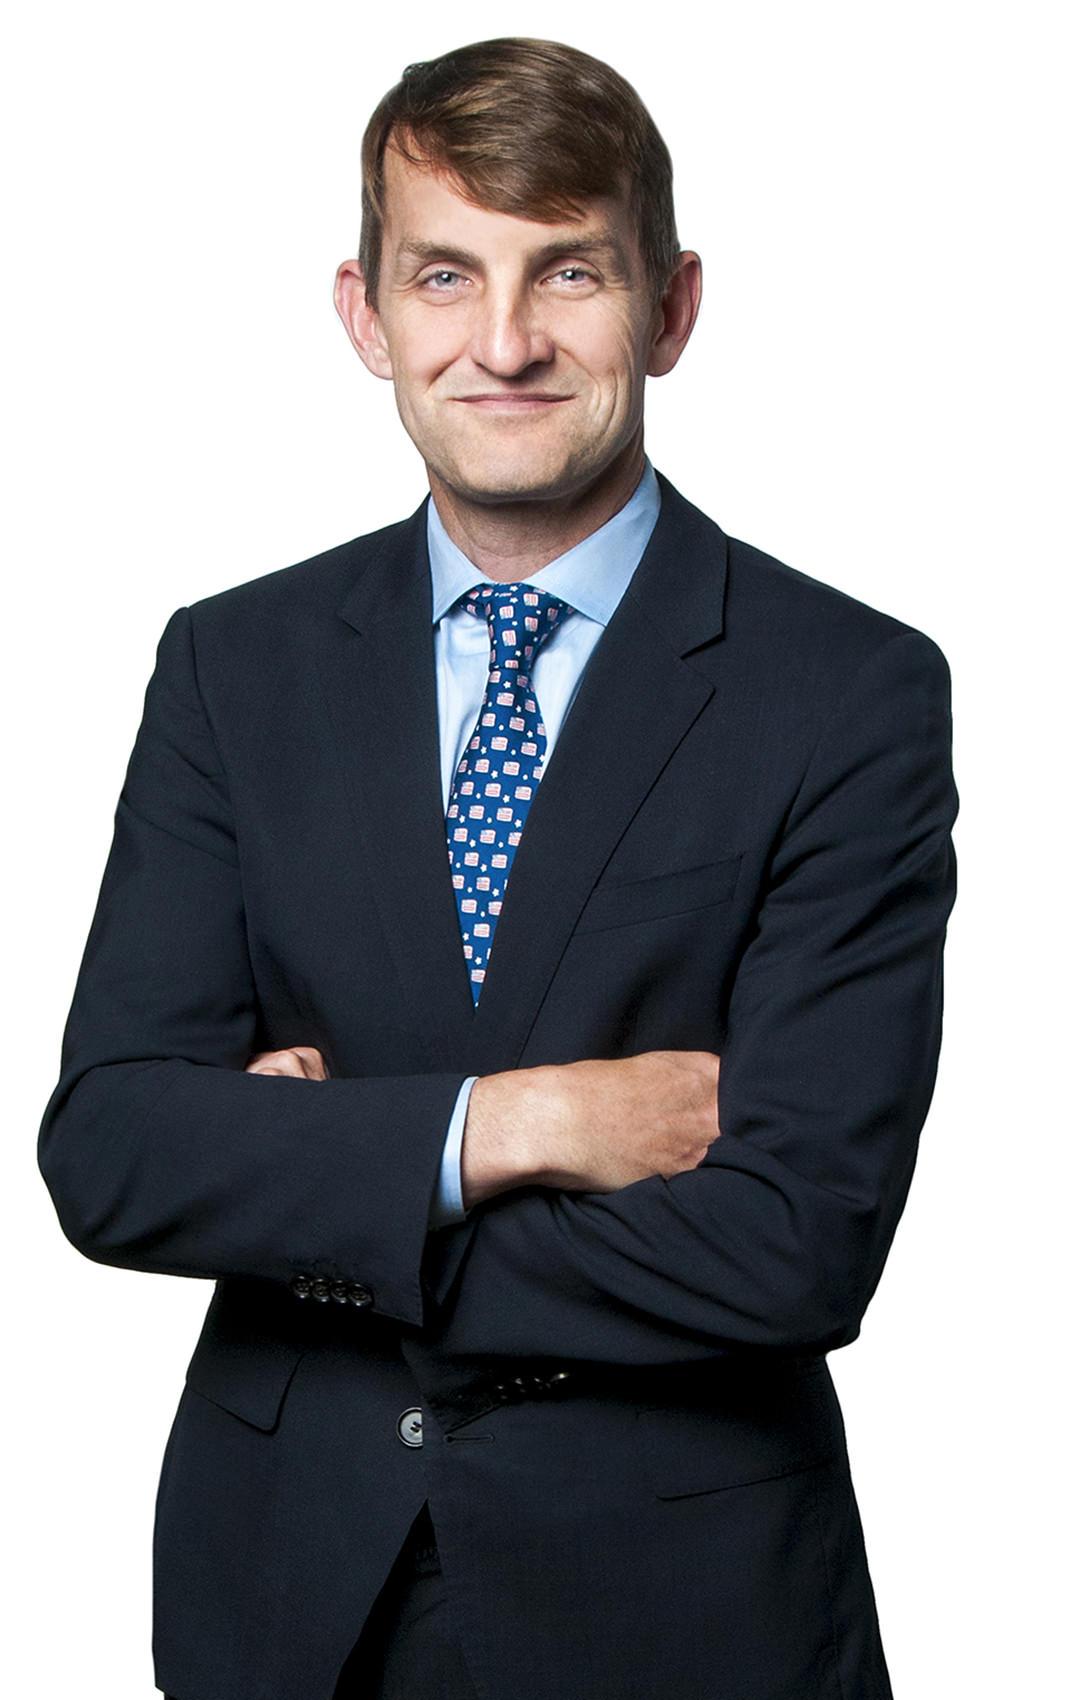 J. Brennan Ryan